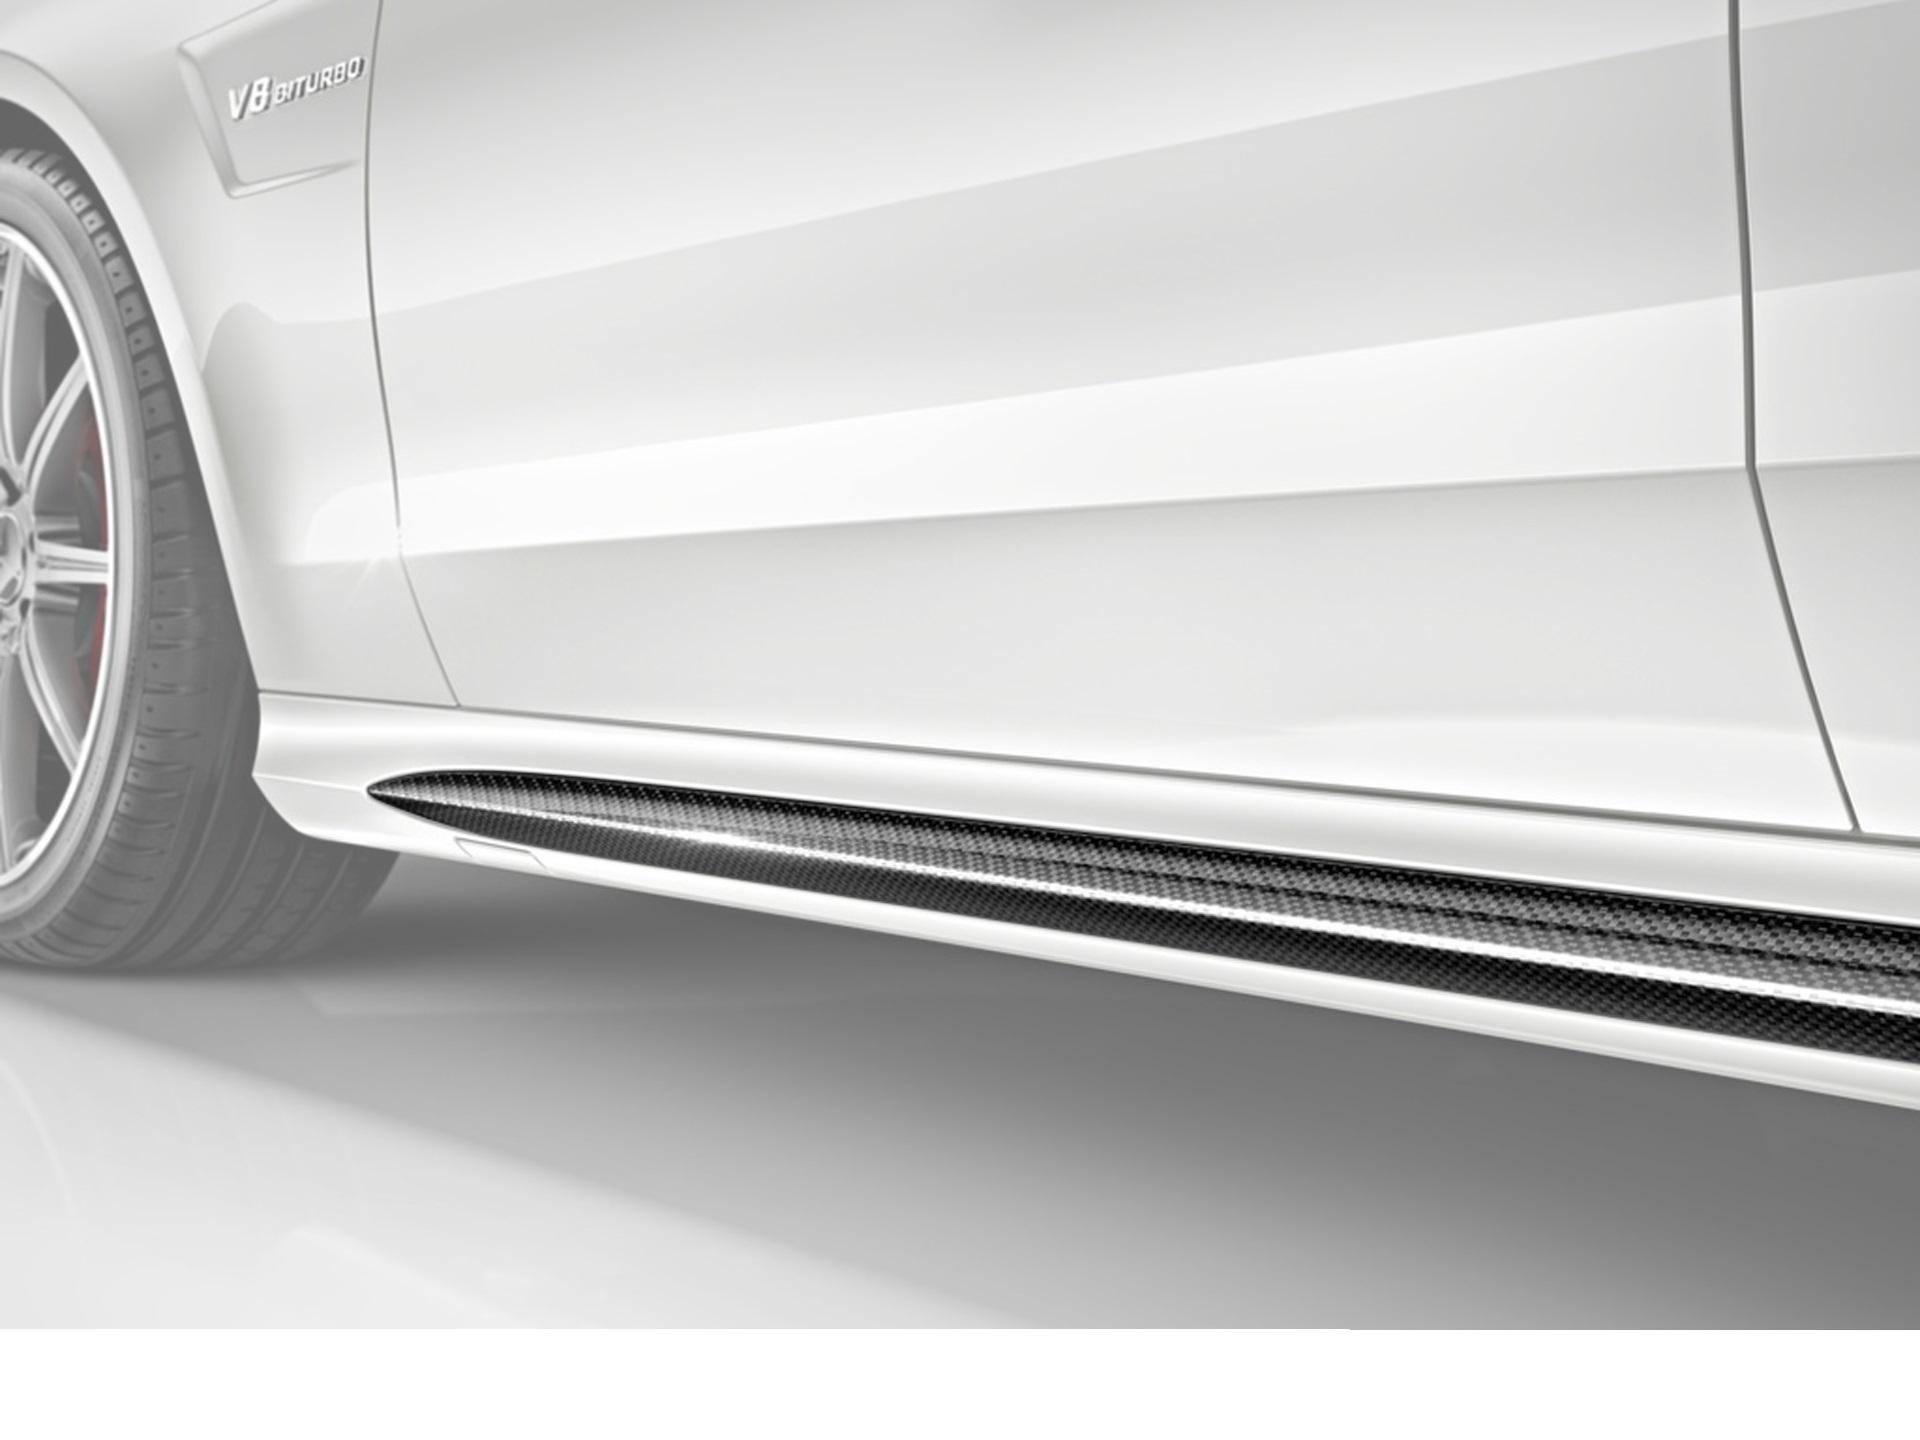 Карбоновые накладки на пороги 63 AMG Style для Mercedes E-class W212